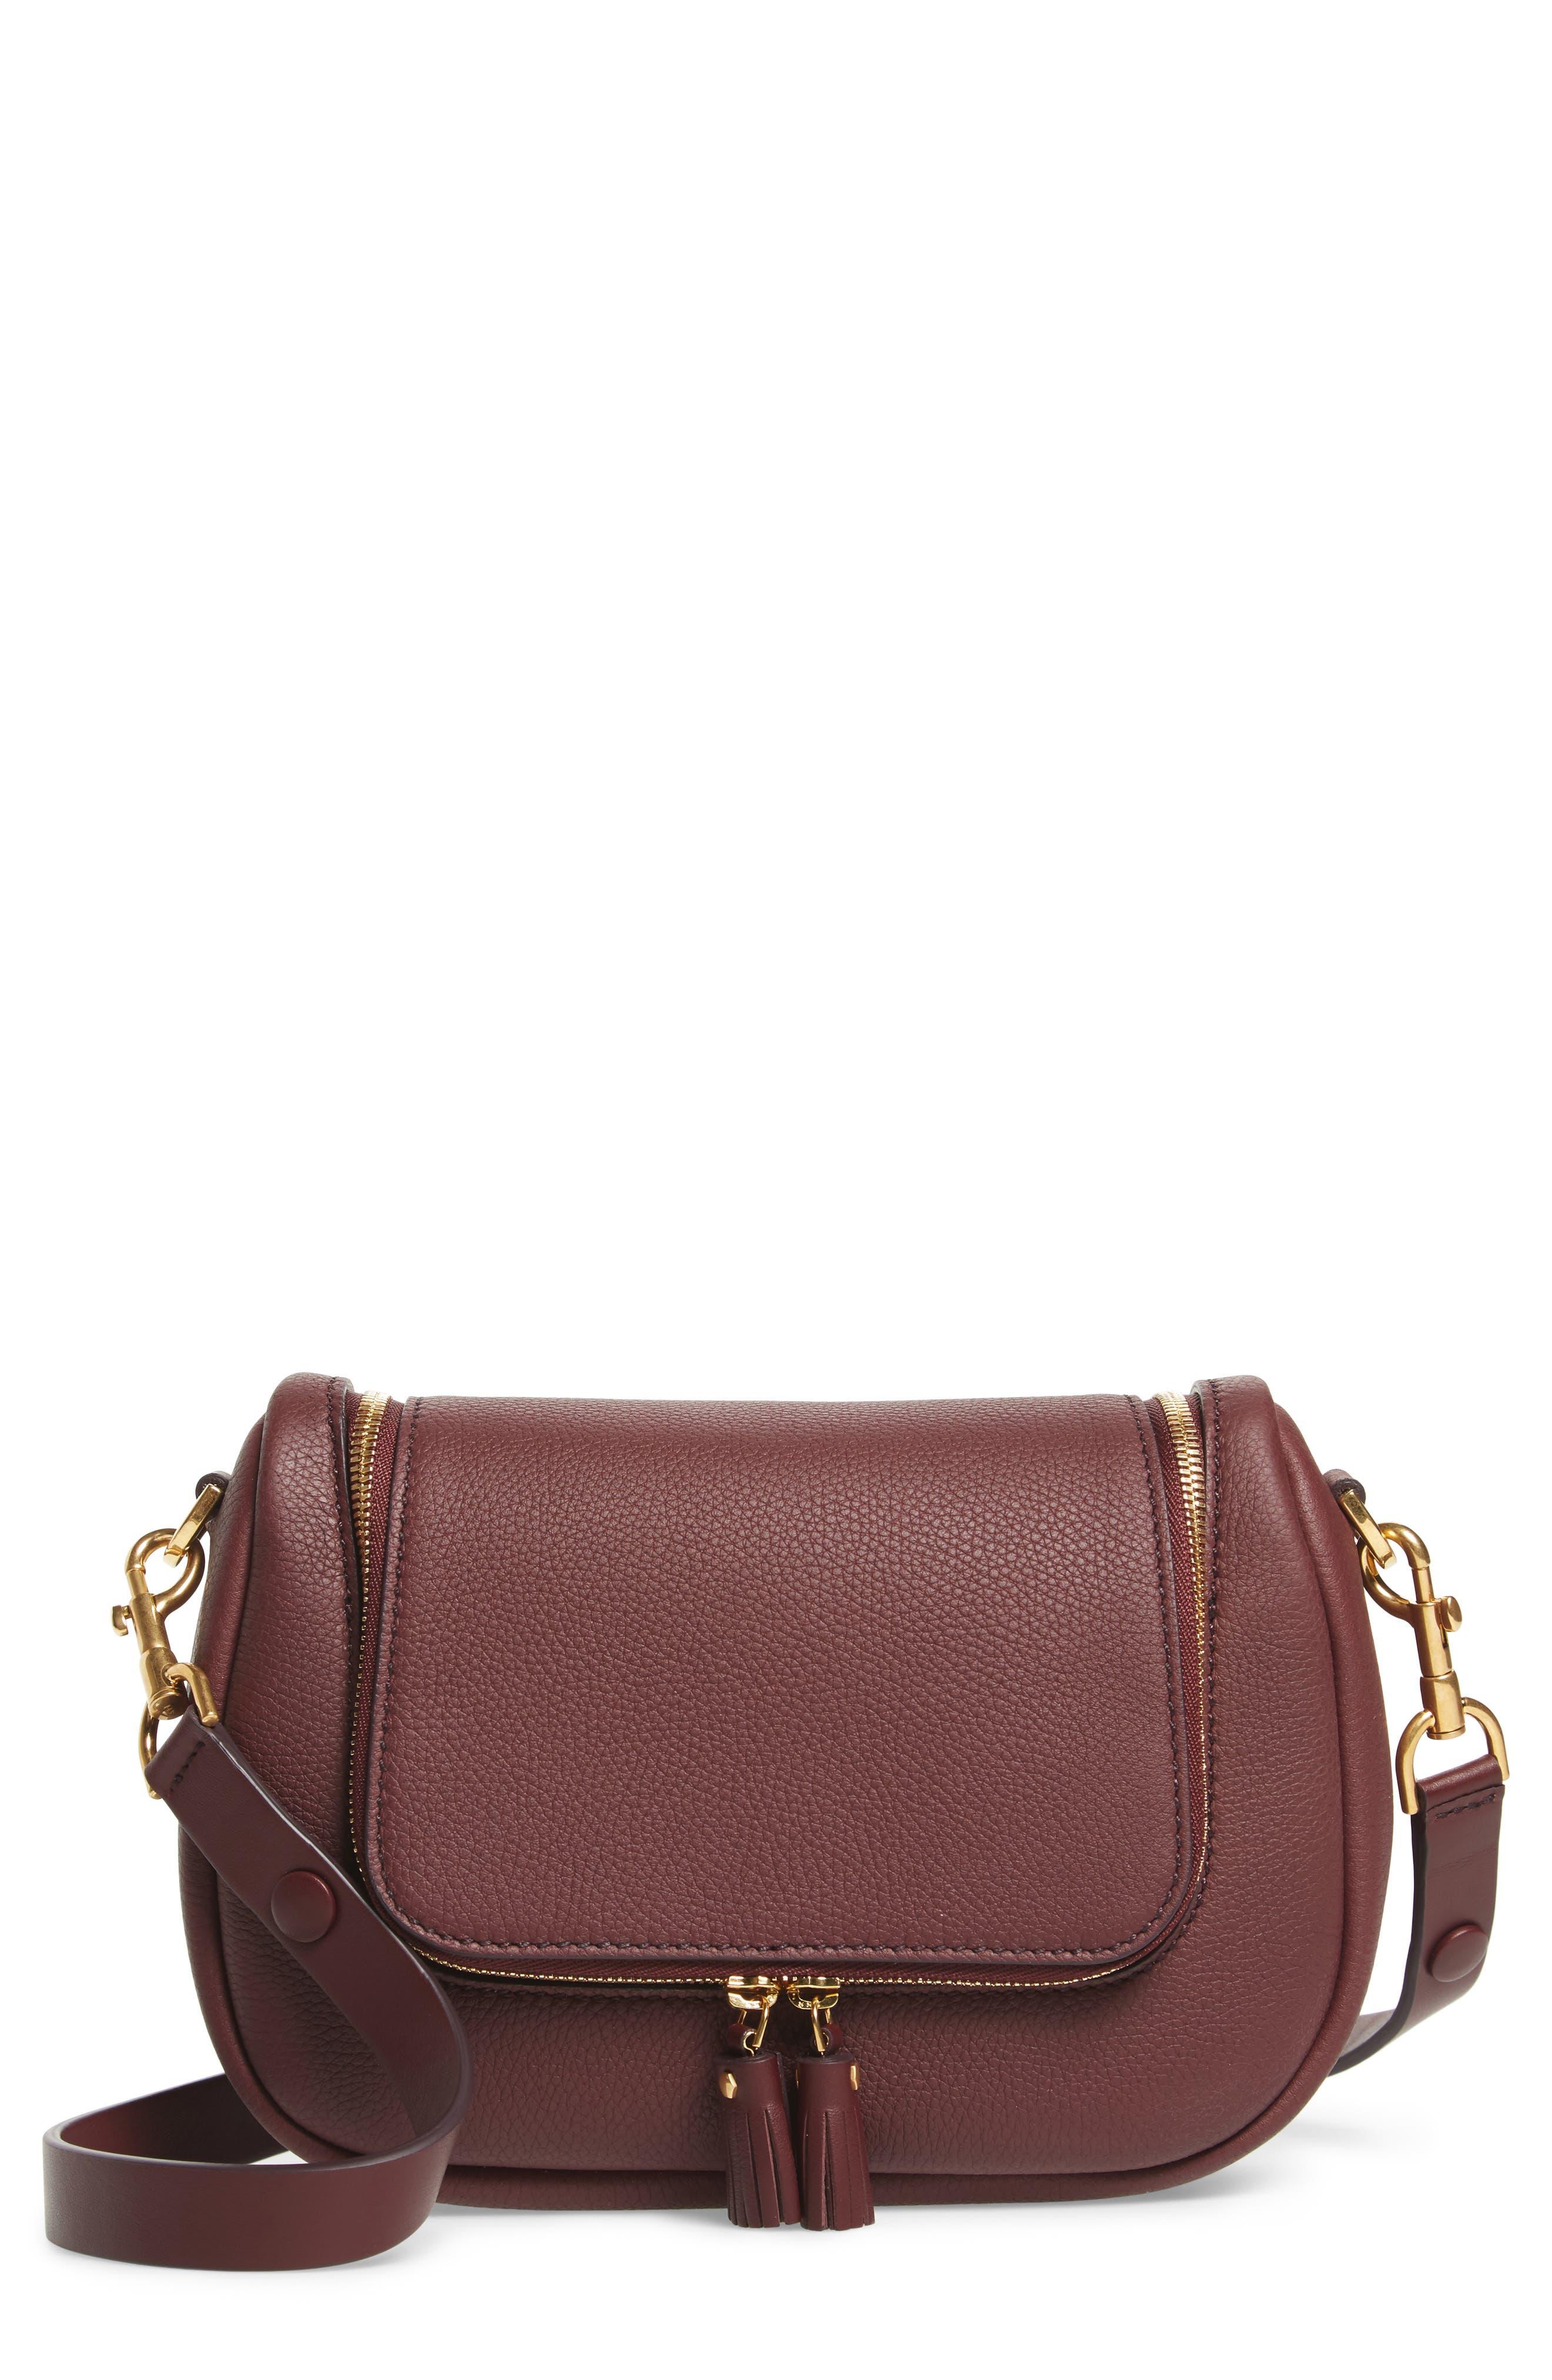 Anya Hindmarch Small Vere Leather Crossbody Satchel